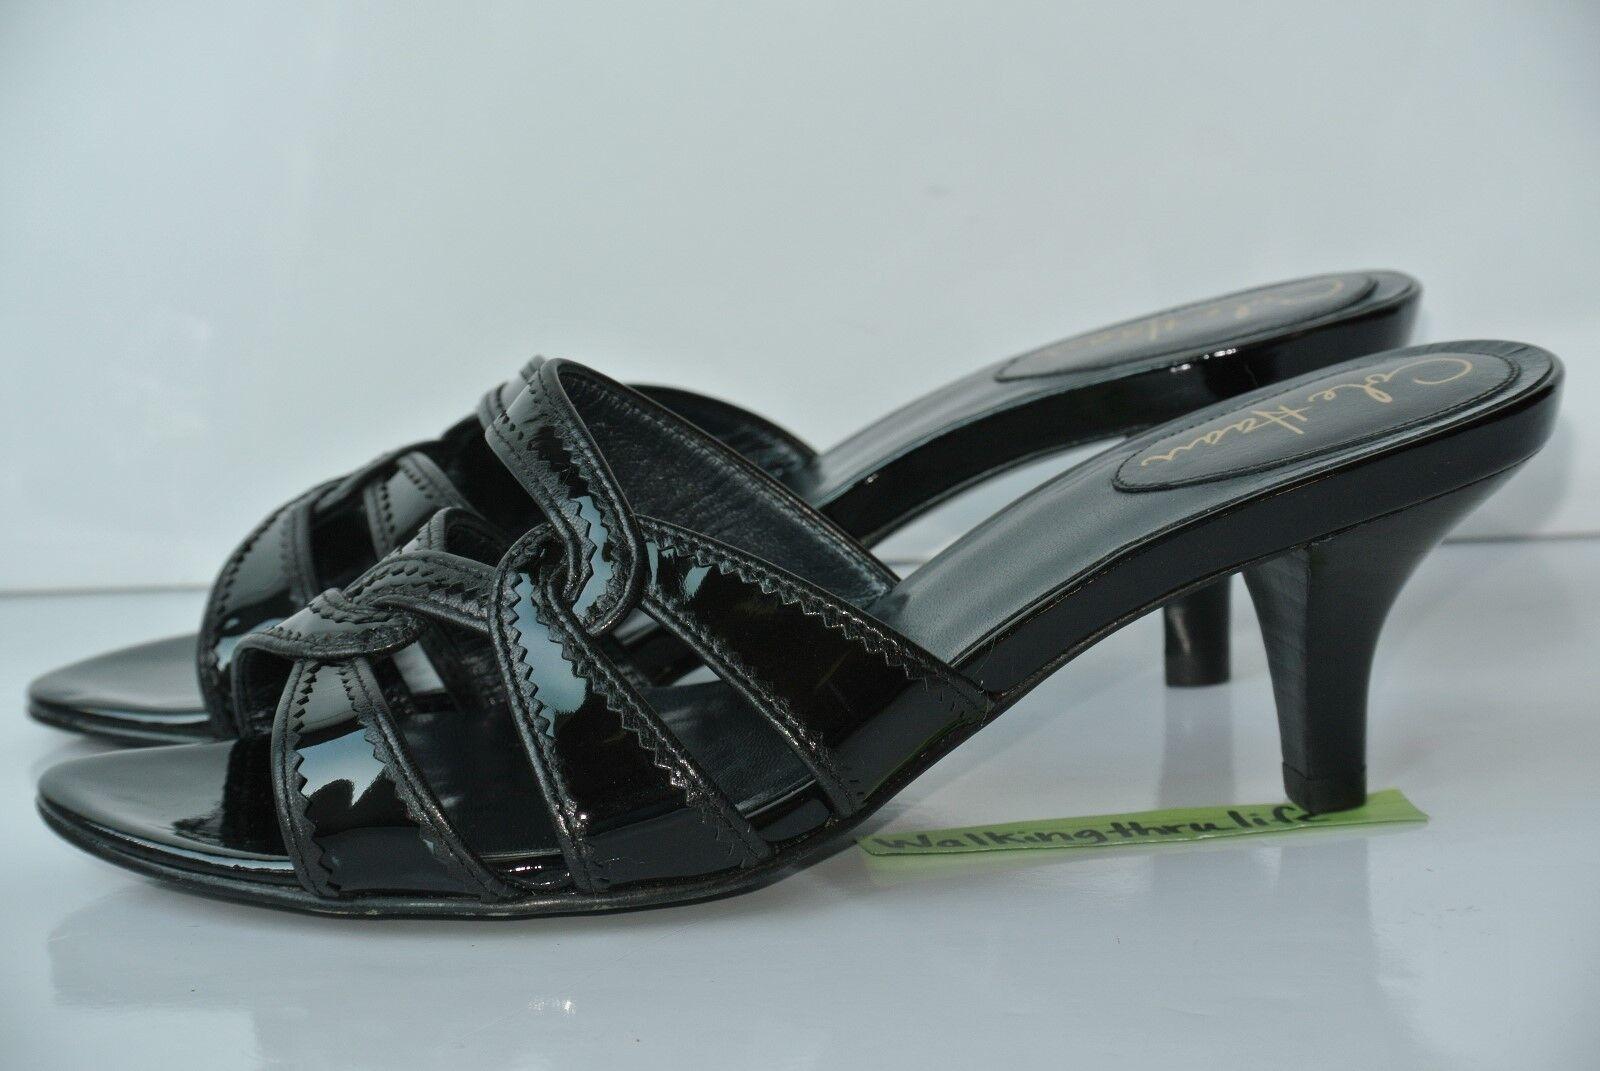 Cole Haan Black Womens Sz 7.5 B Black Haan Patent Leather Sandals Heels NICE!! 3ed5dd